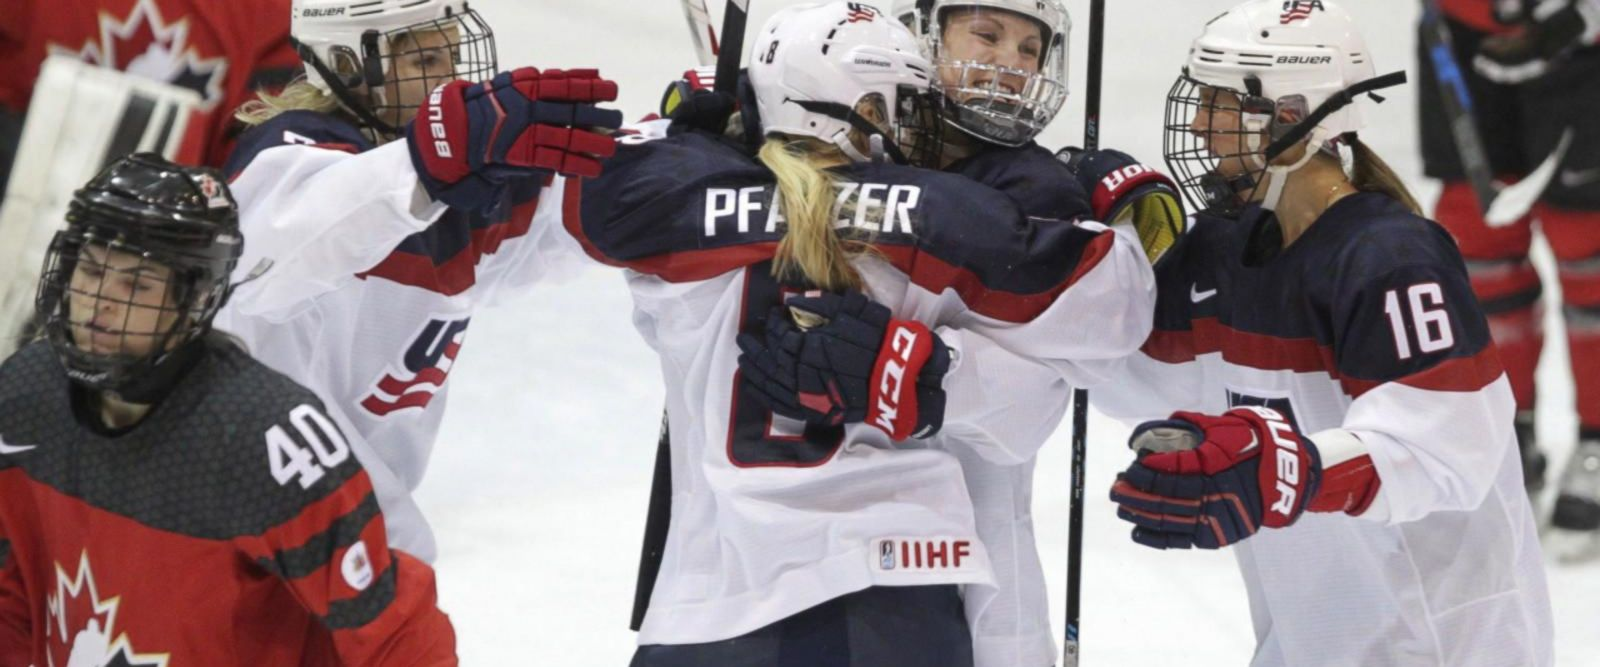 VIDEO: US women's hockey team plans to boycott world championship